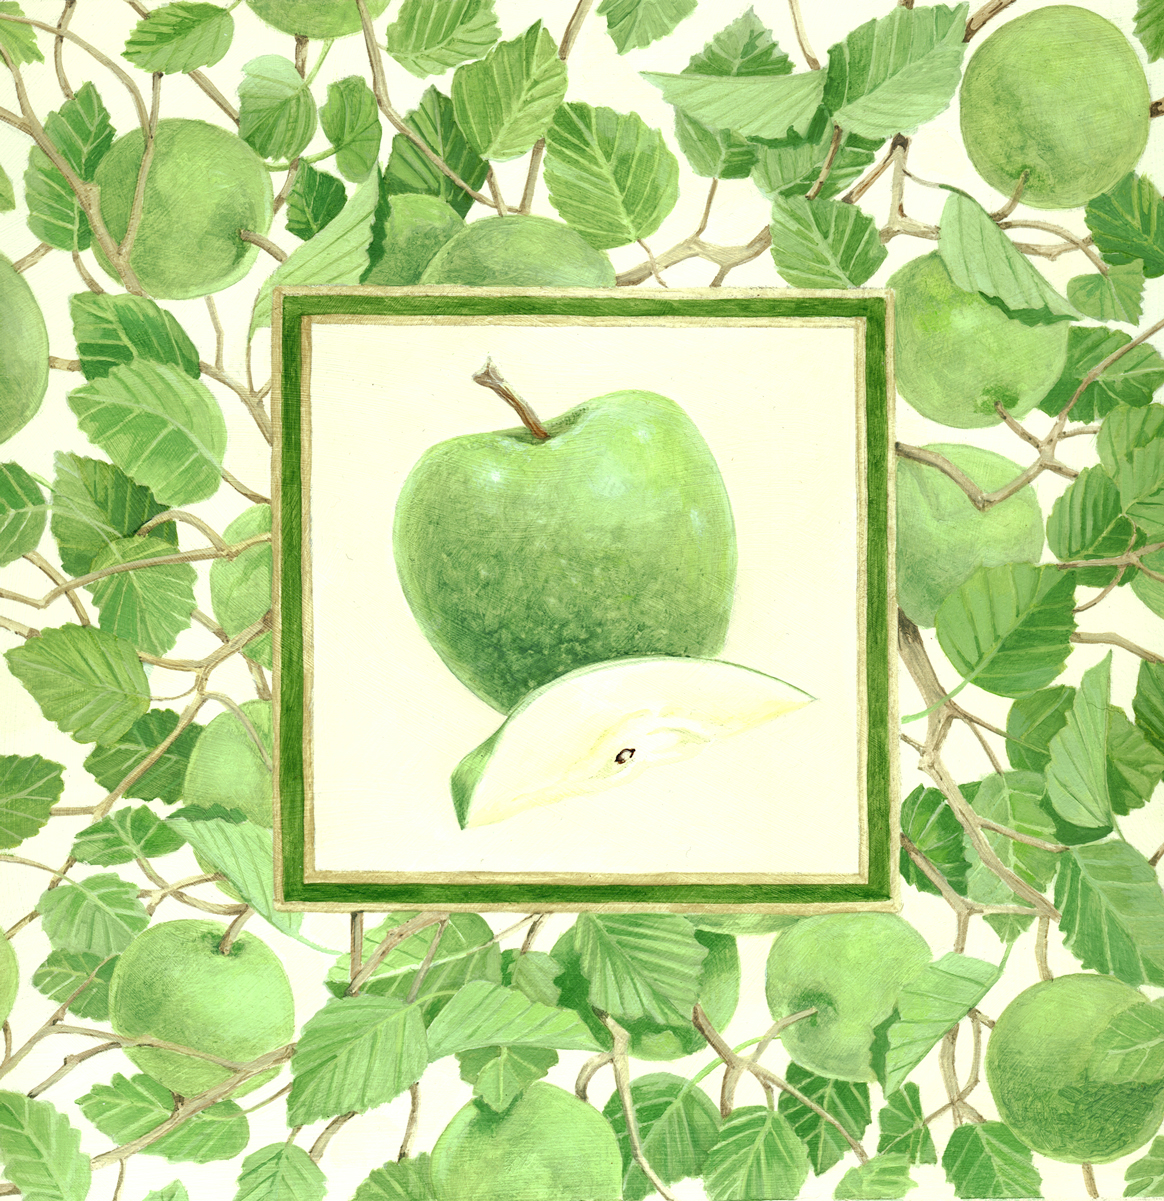 146-apple.jpg